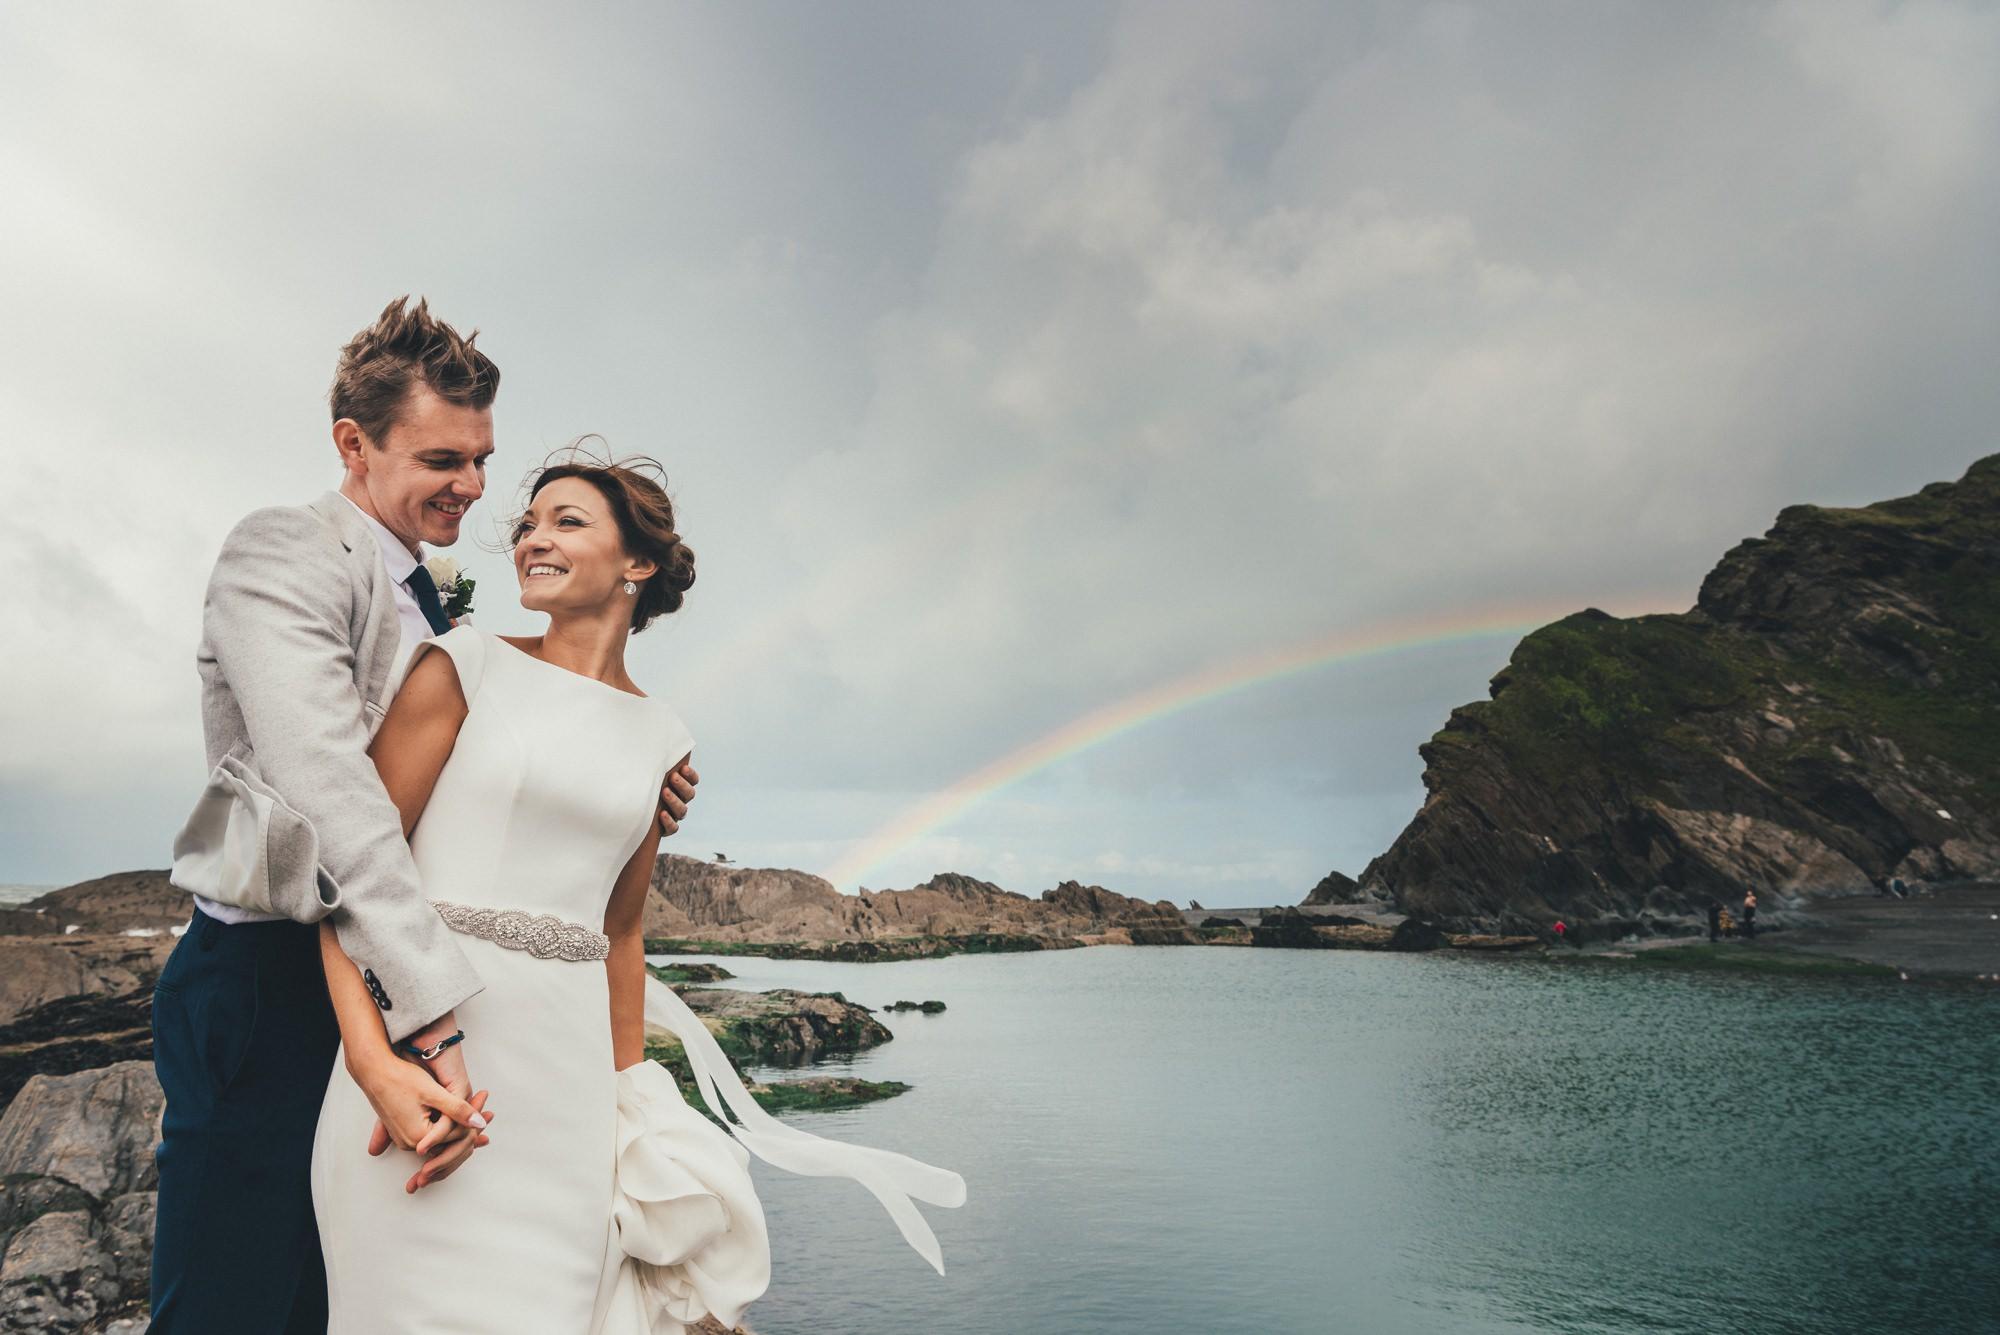 Tunnels Beaches Wedding Photography: Jon & Carly, Tunnels Beaches Wedding Photography